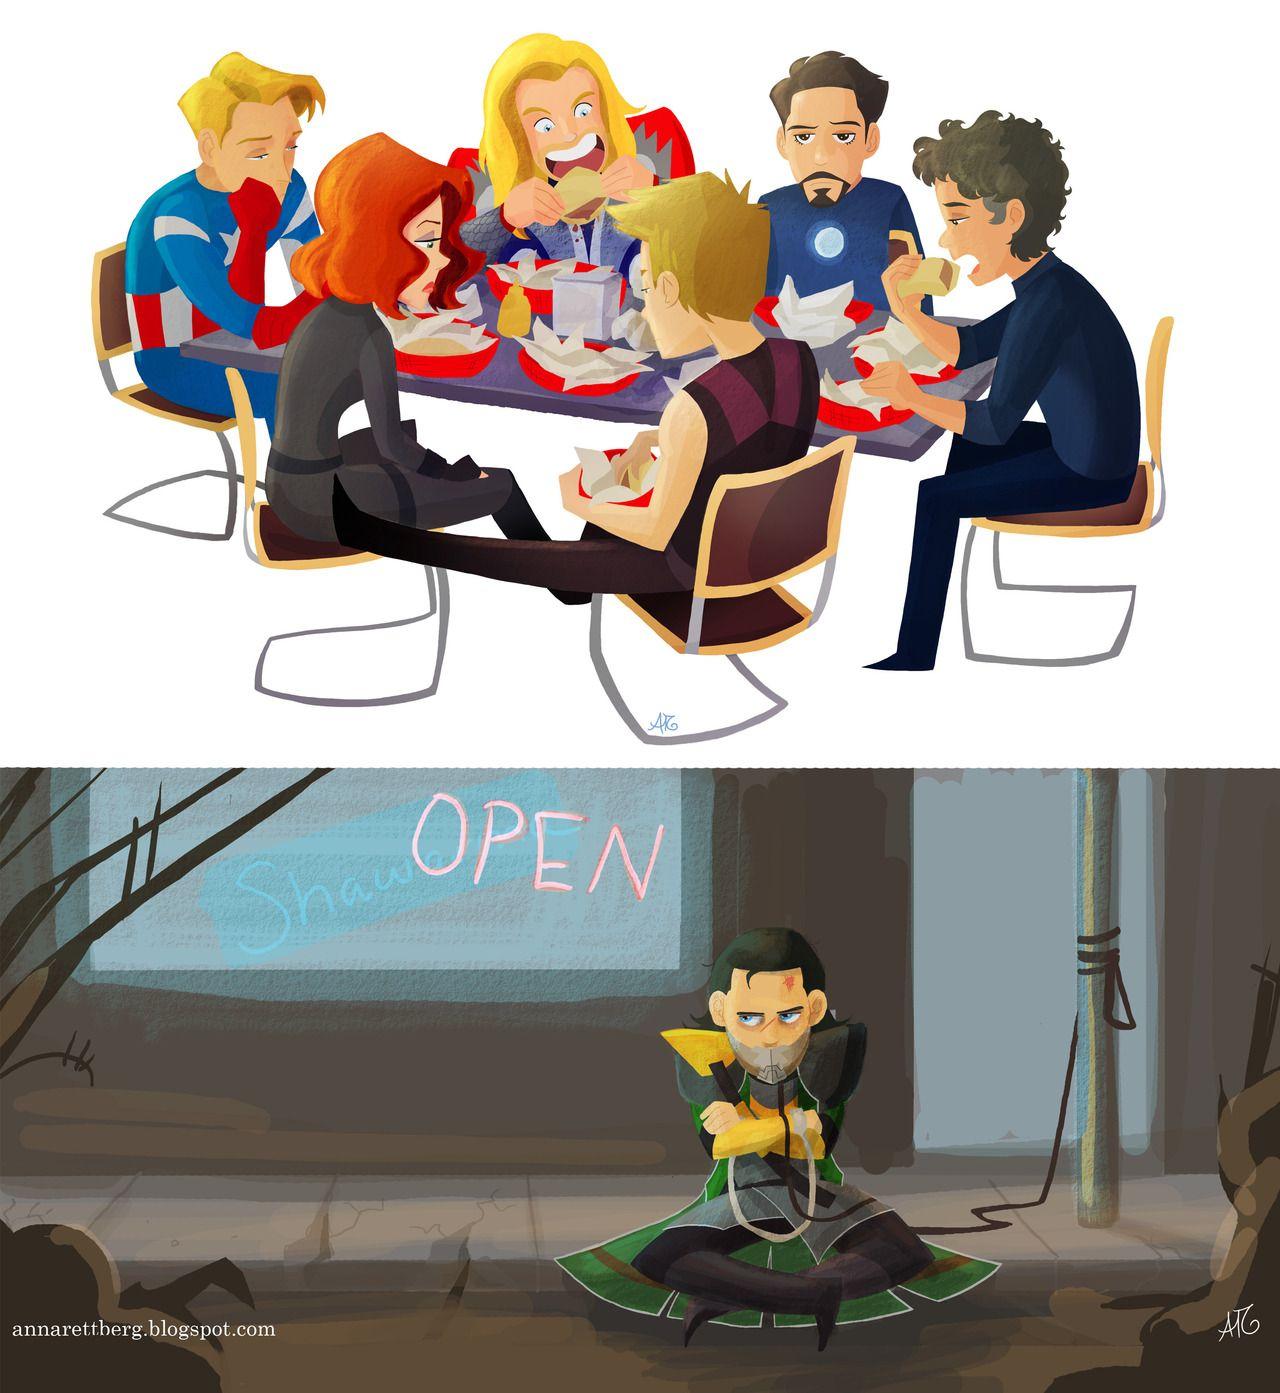 No schawarma for Loki :(